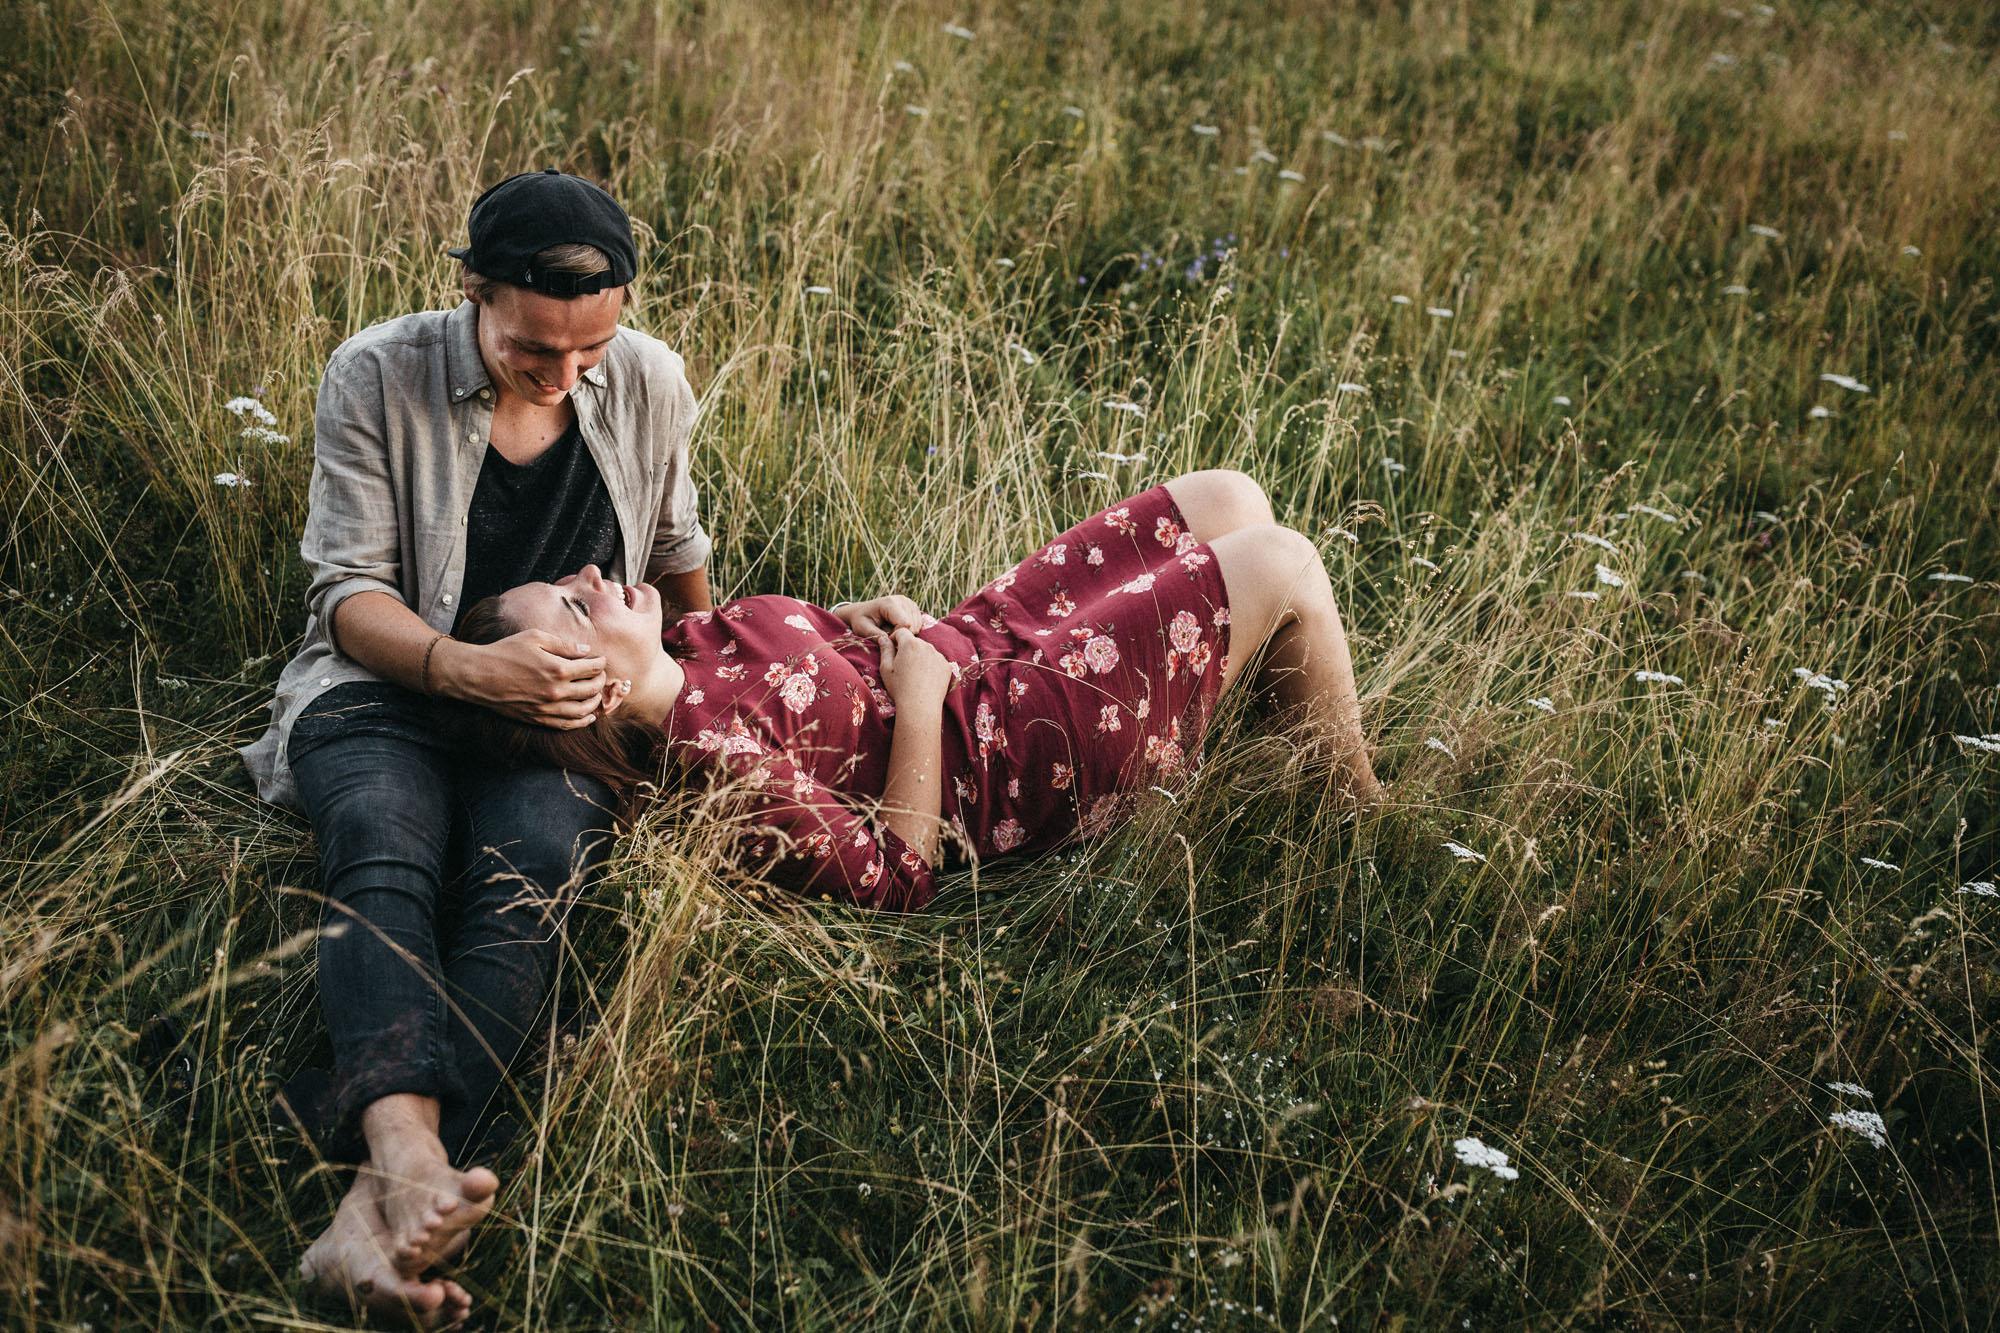 raissa simon photography jule florian feldberg schwarzwald 038 - Jule + Florian